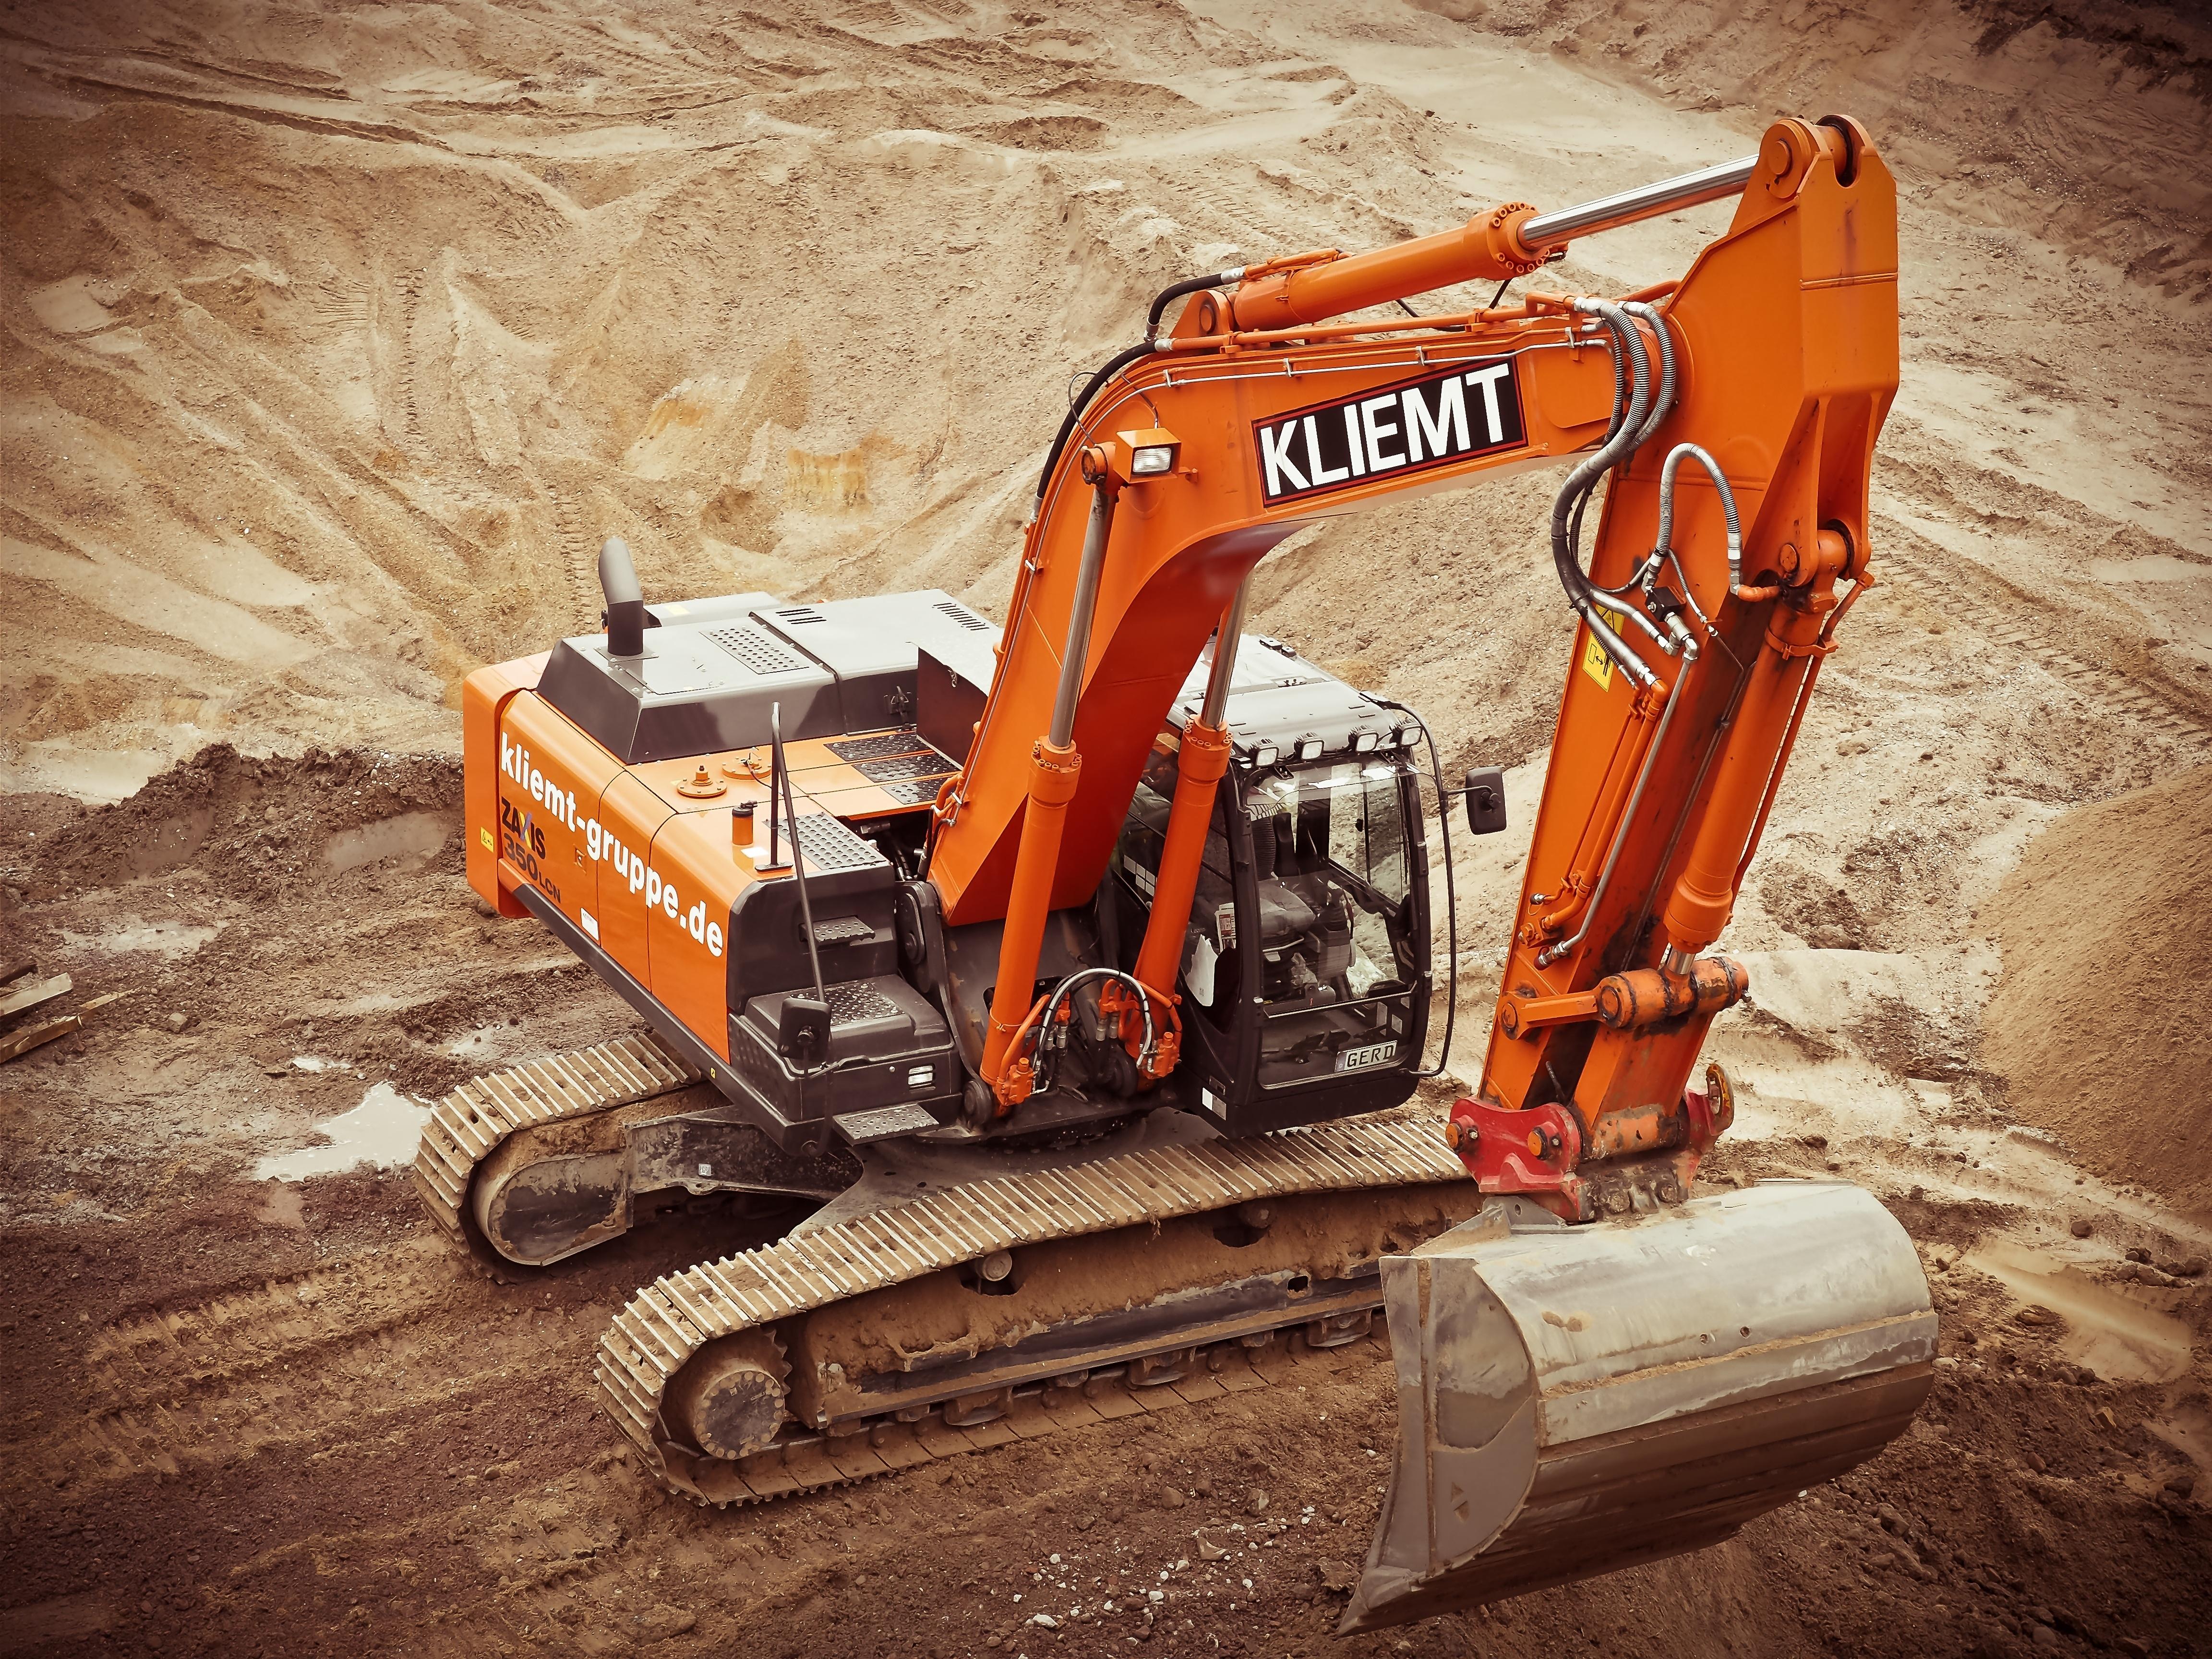 wood construction vehicle bulldozer machines build blade